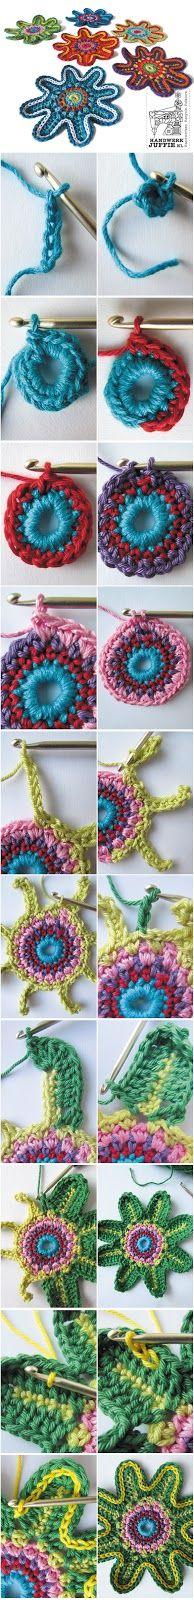 crochet flowers tutorial!! luv!